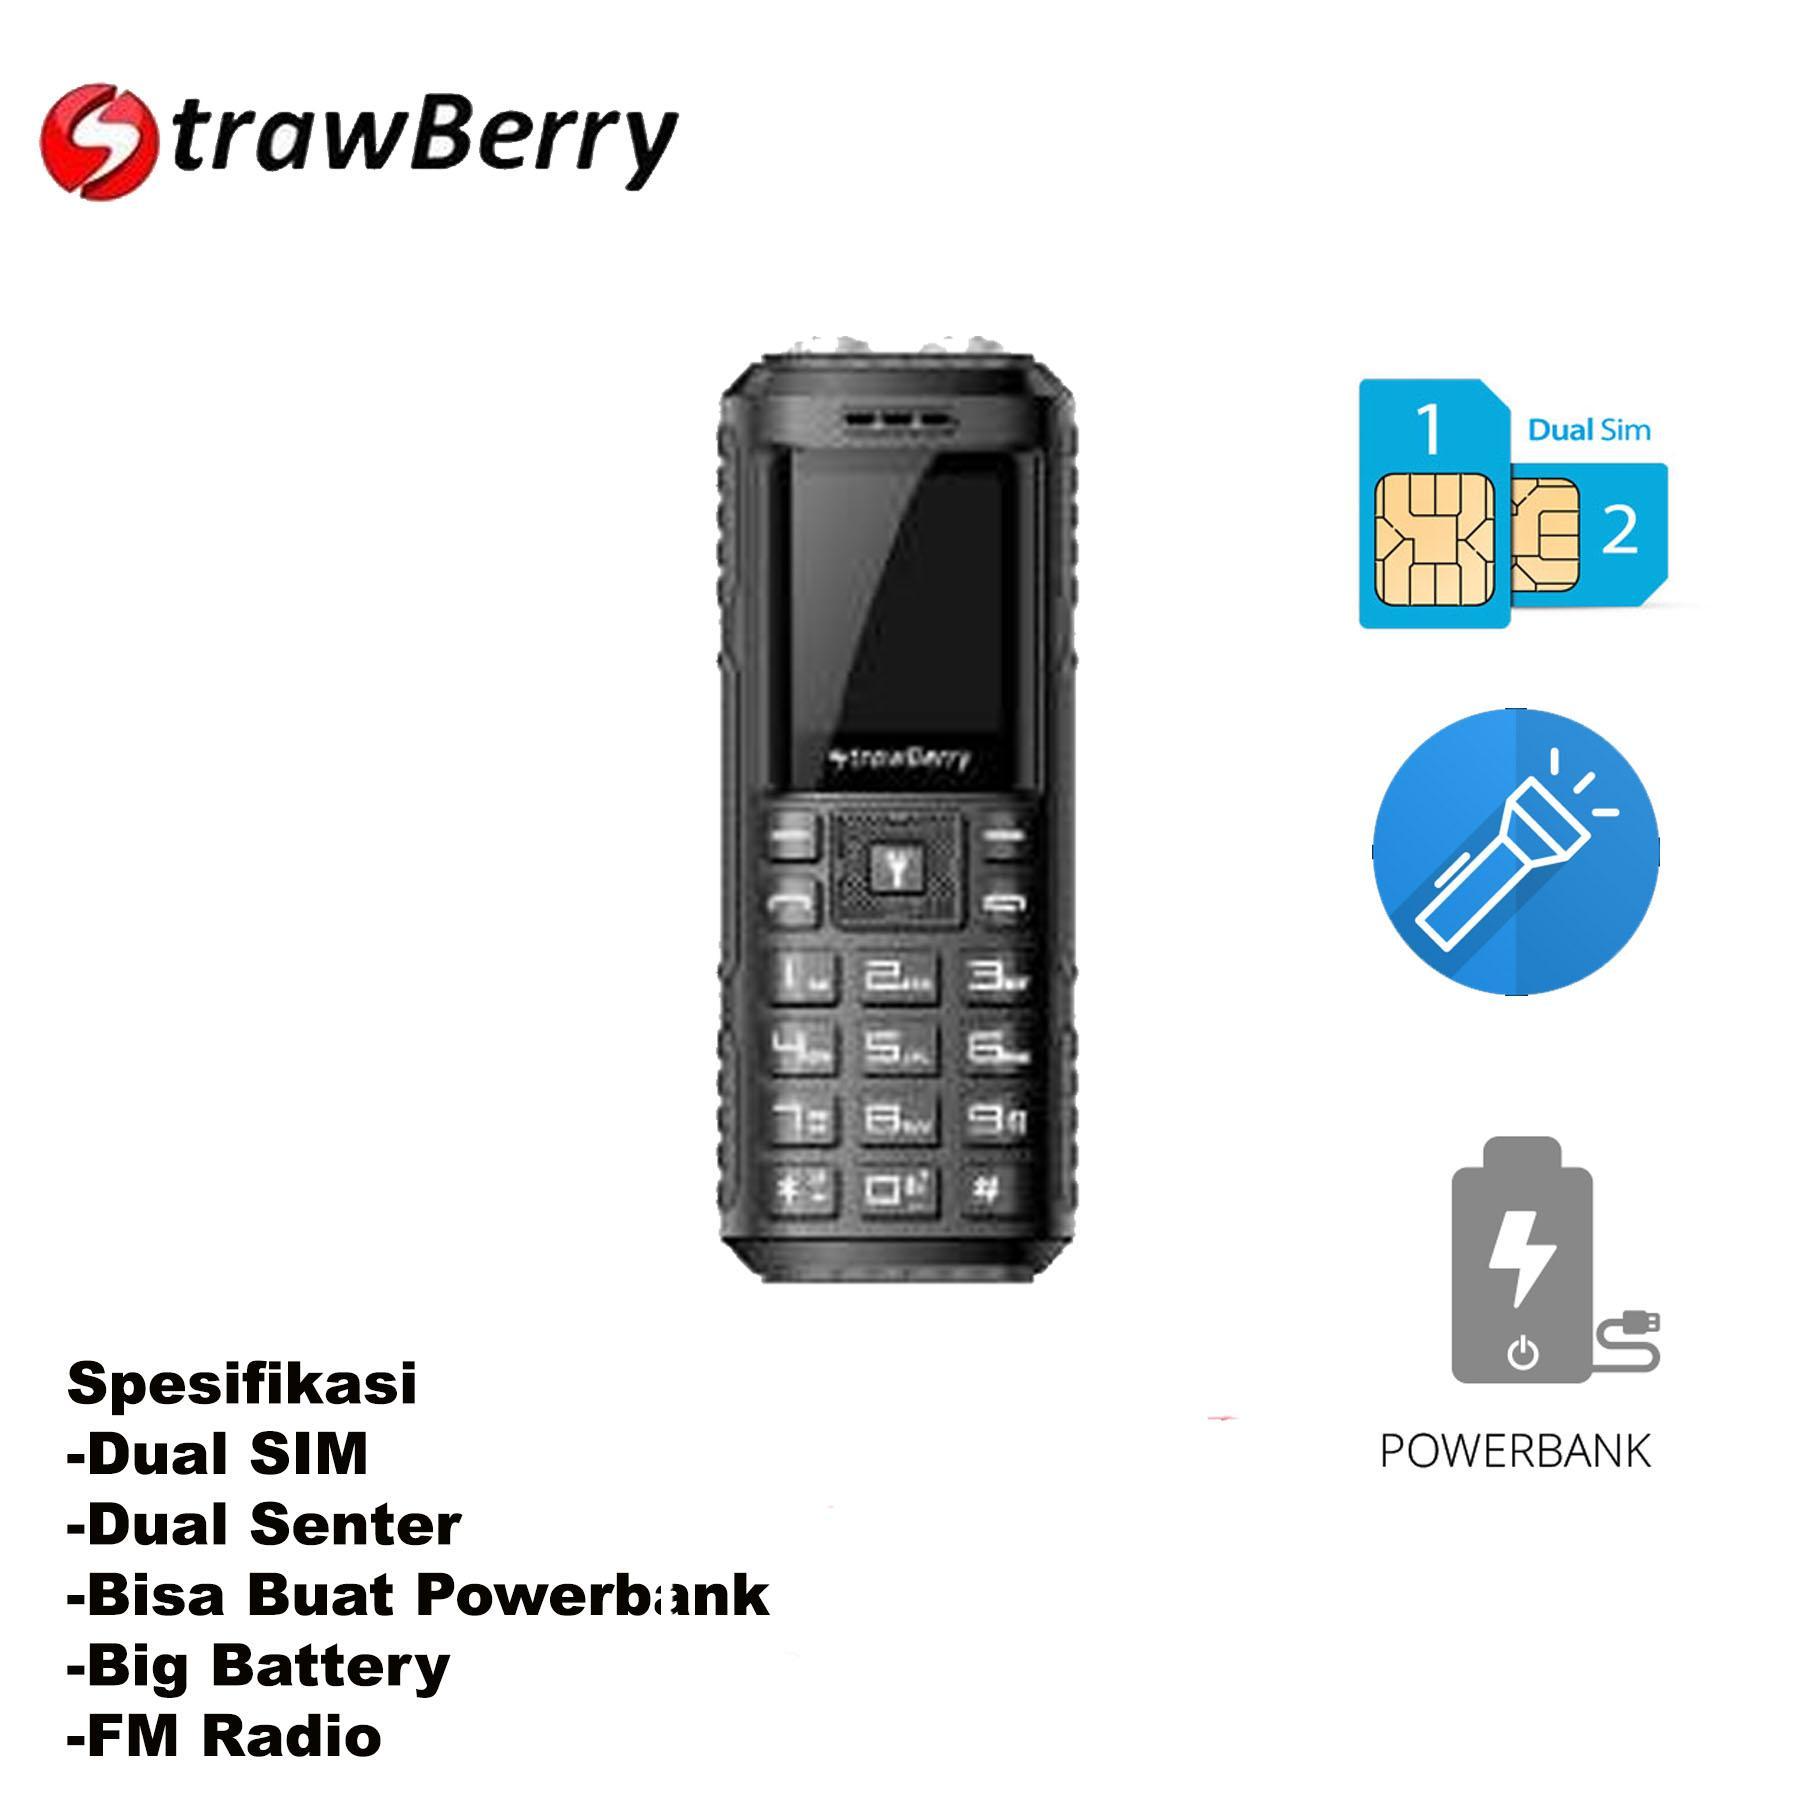 Strawberry ST188 2 Senter Dual SIM Powerbank Camera